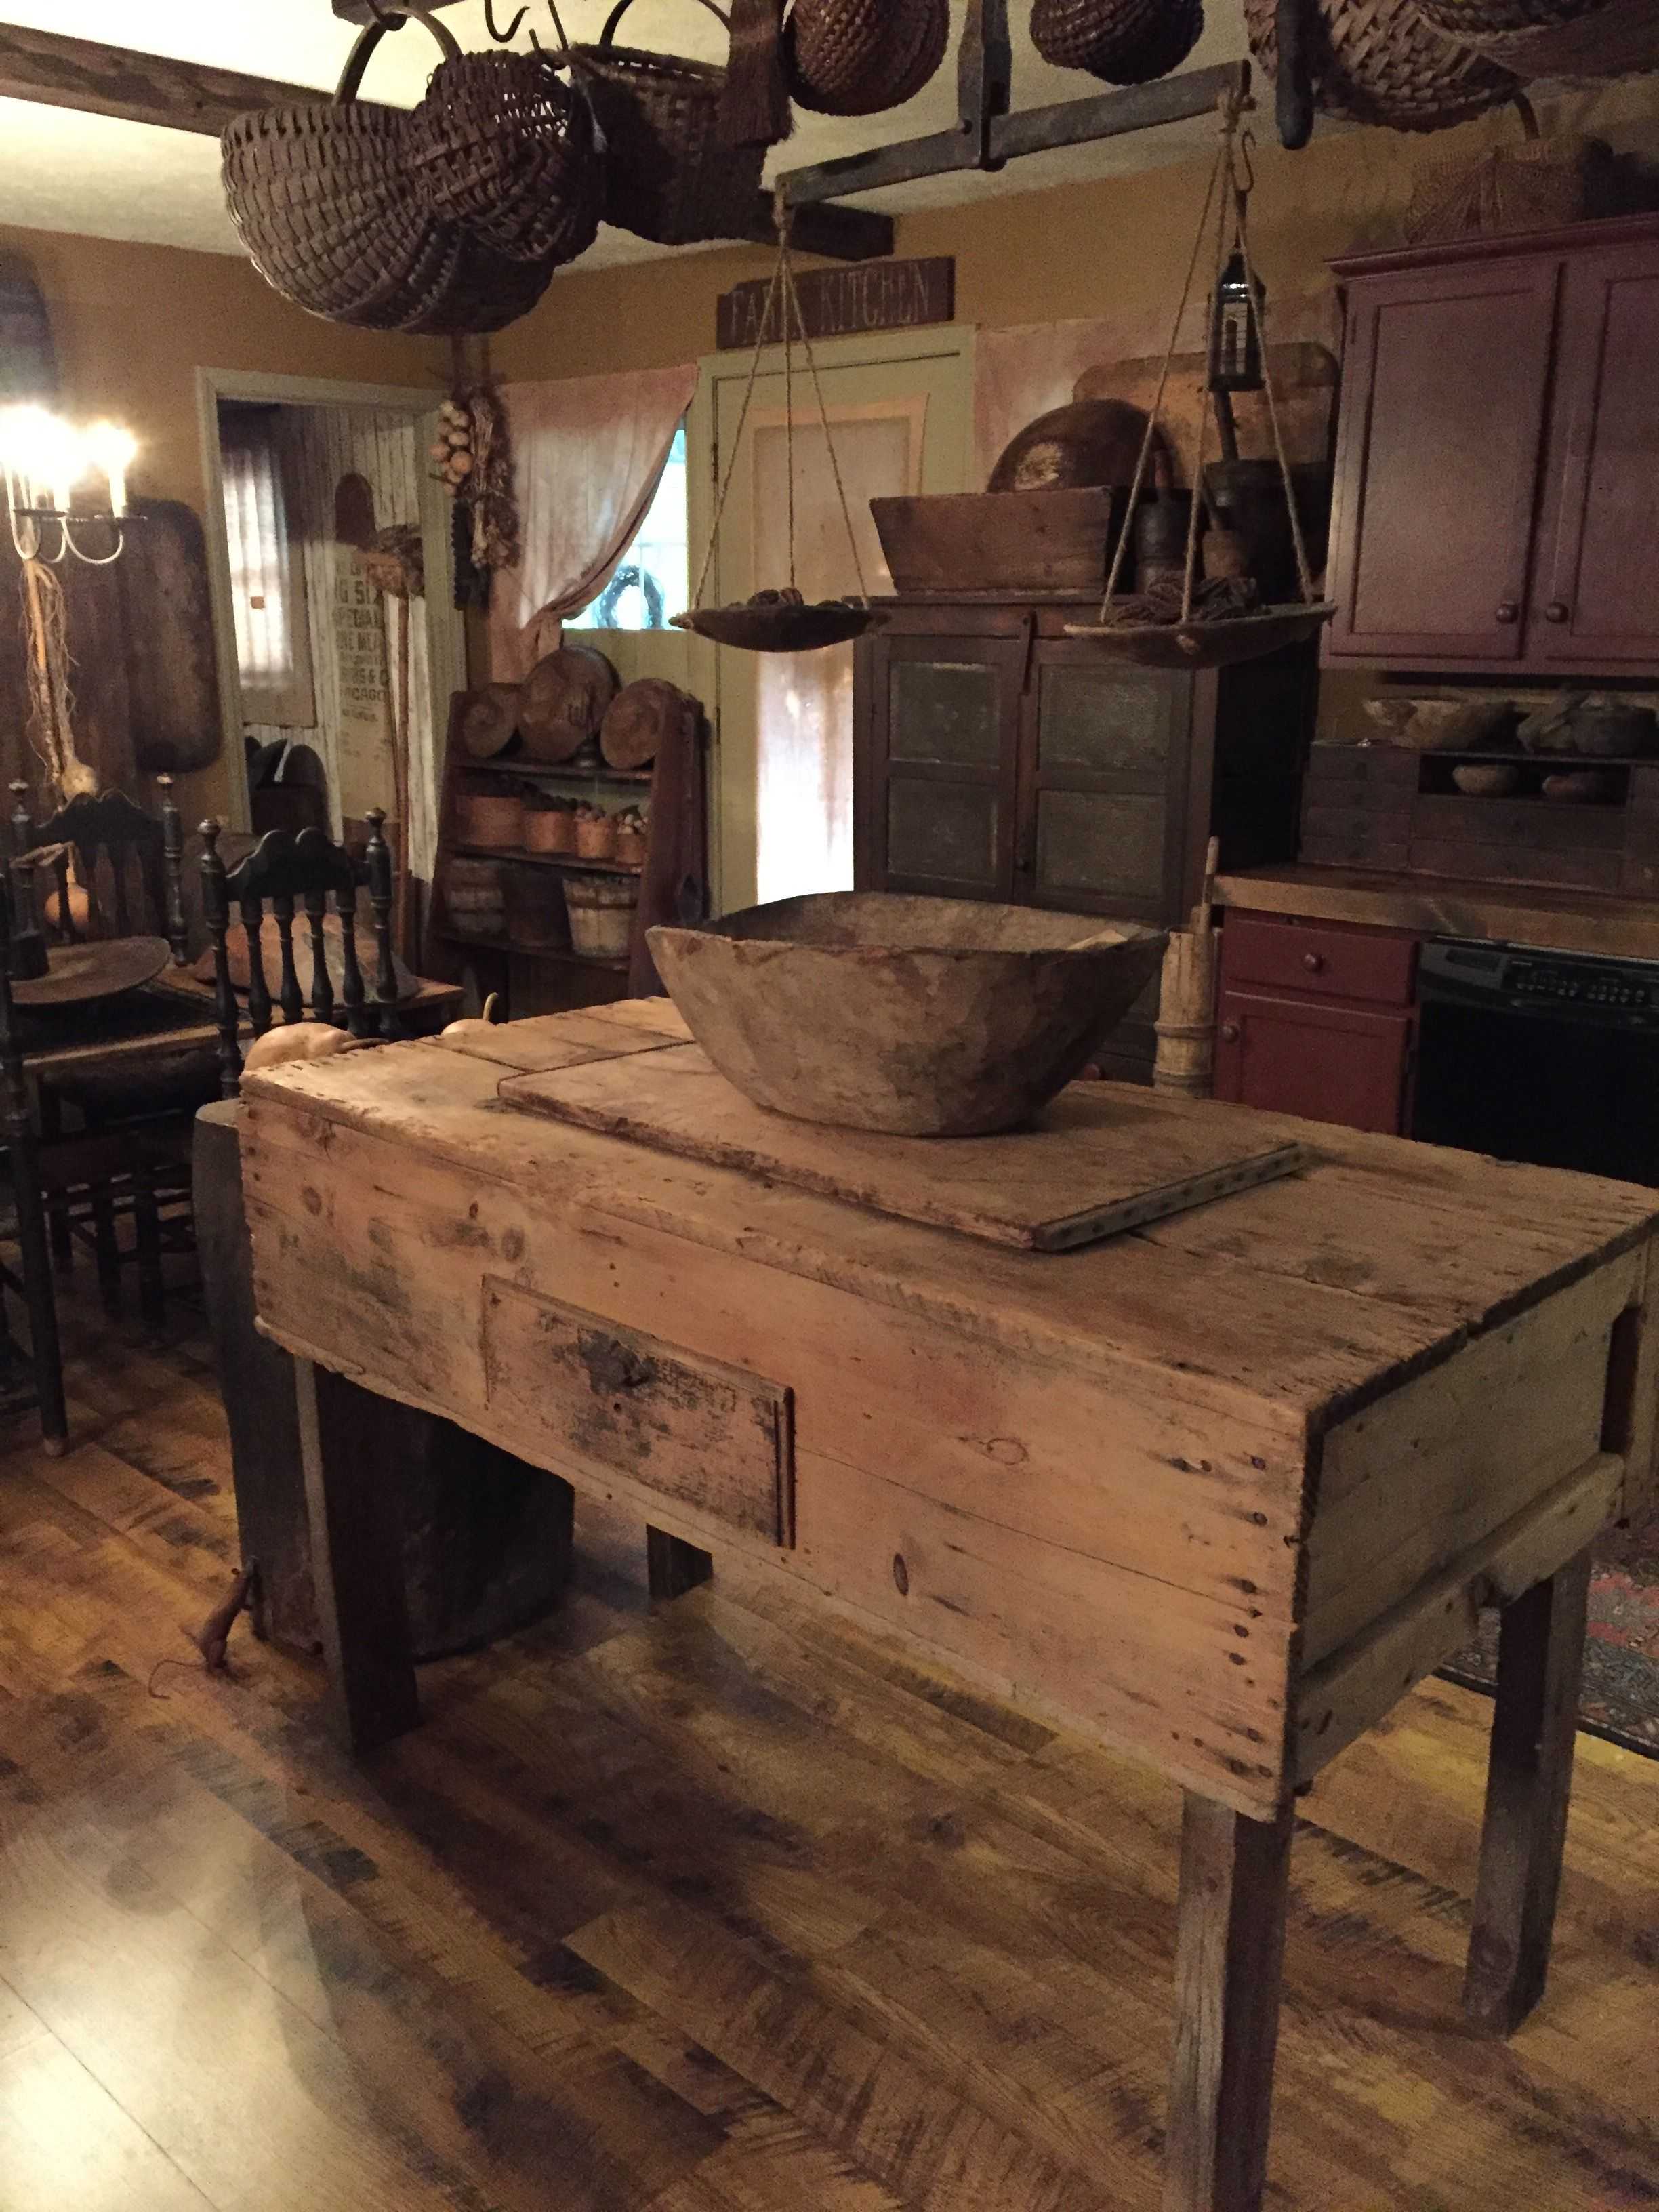 Primitive Kitchen Island | Ideas for dining room decor | Pinterest ...